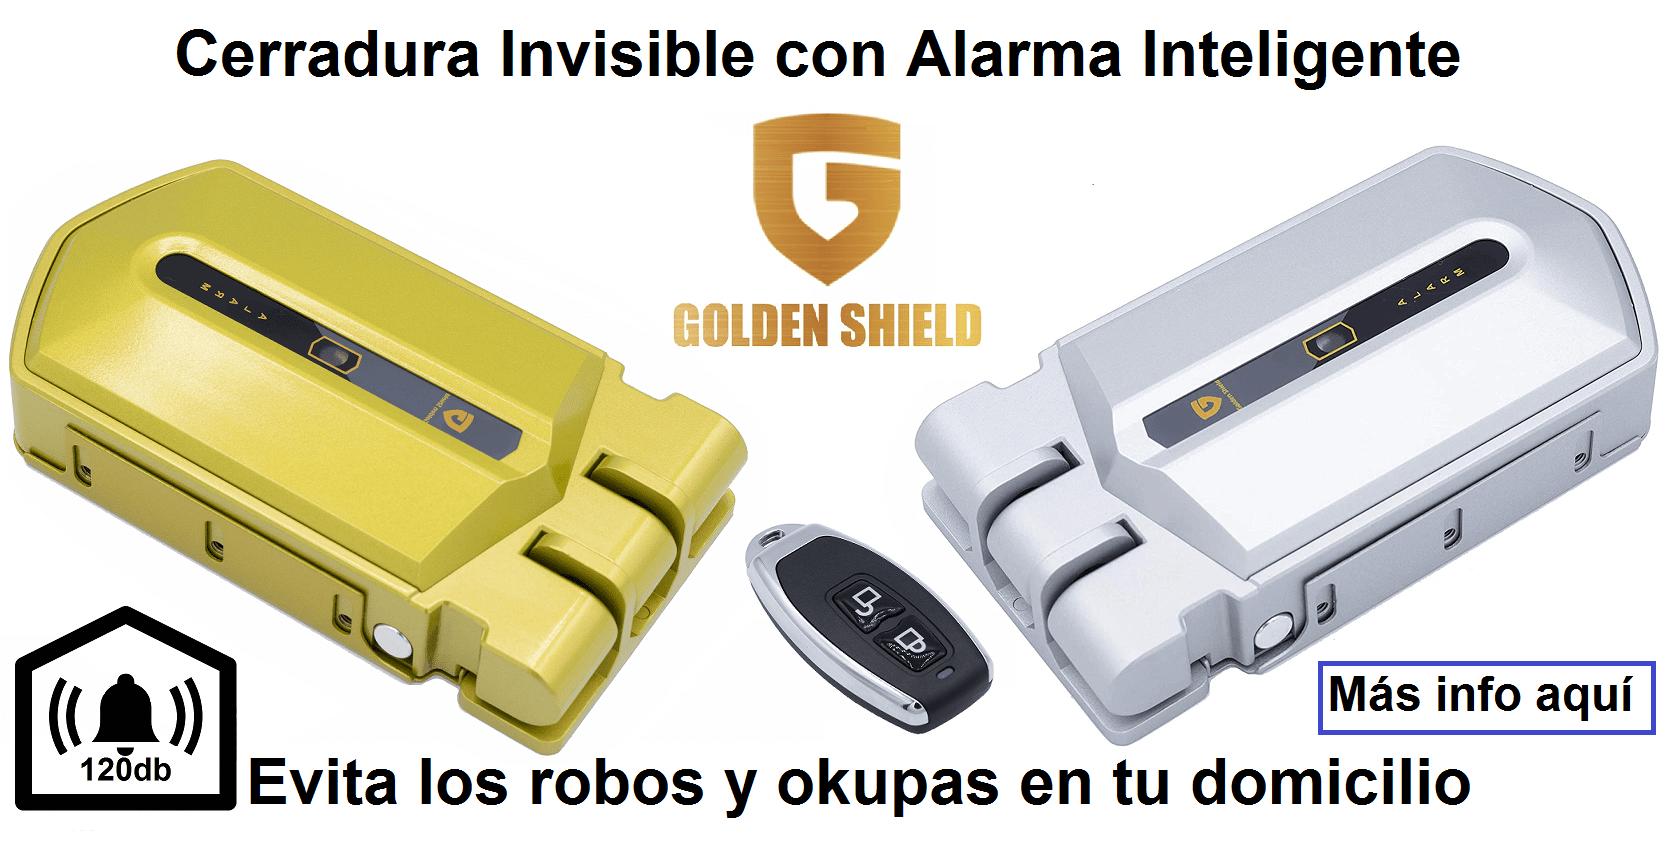 Golden shield alarm